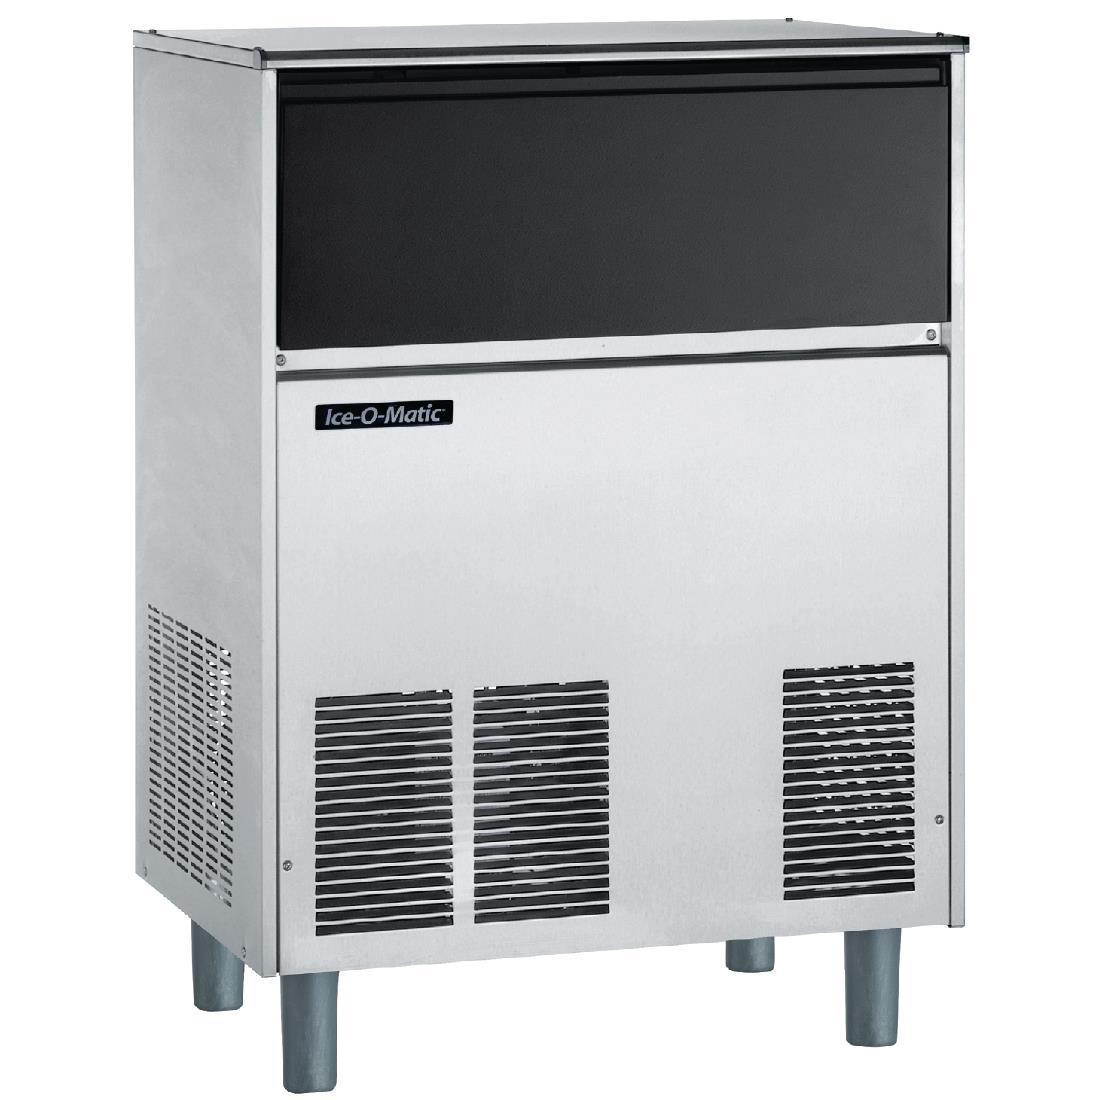 Ice-O-Matic Thimble Ice Maker 88kg Output ICEU186P (GG574)